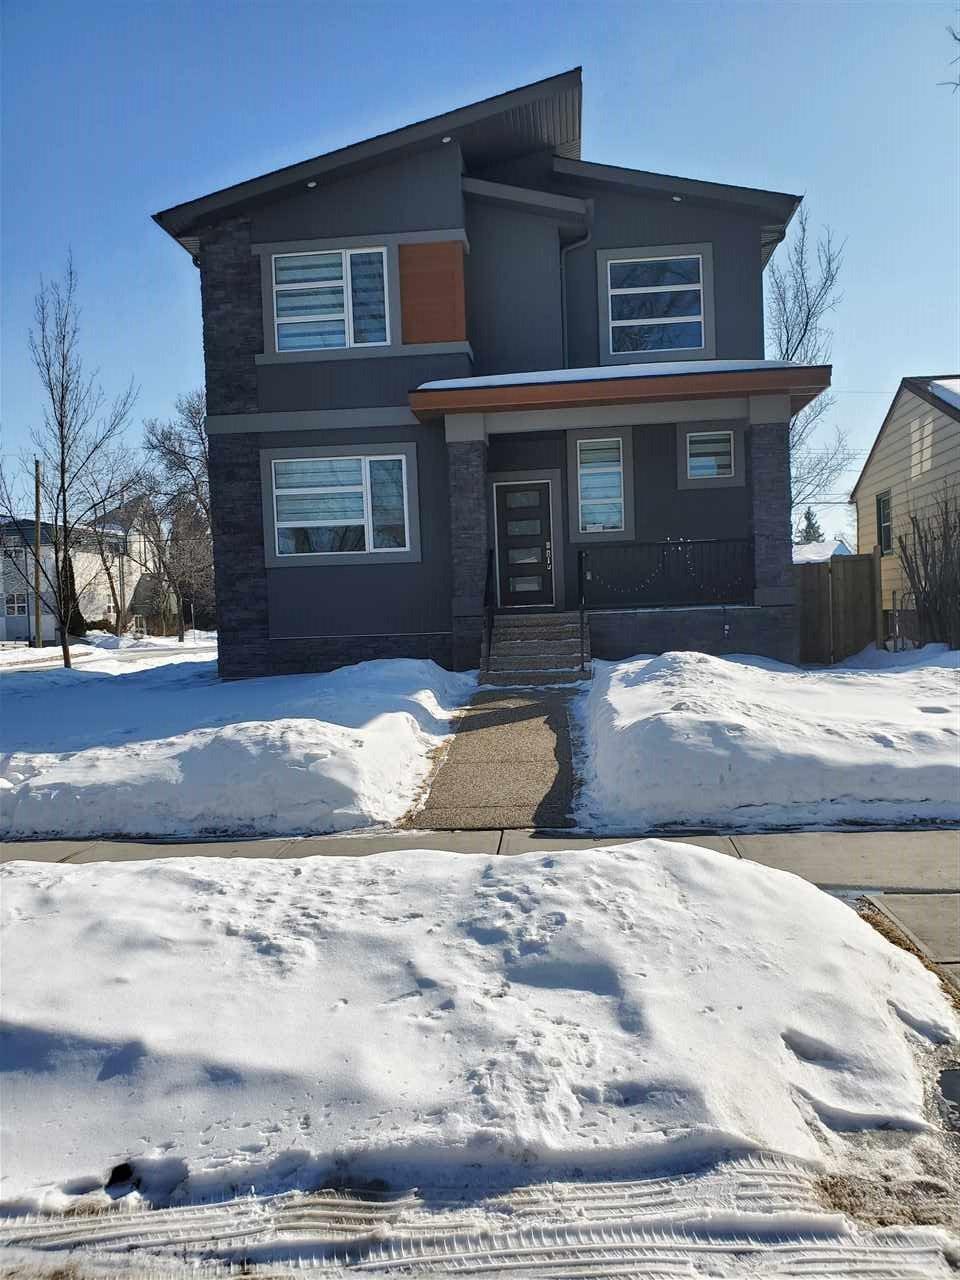 Main Photo: 9503 70 Avenue in Edmonton: Zone 17 House for sale : MLS®# E4192361